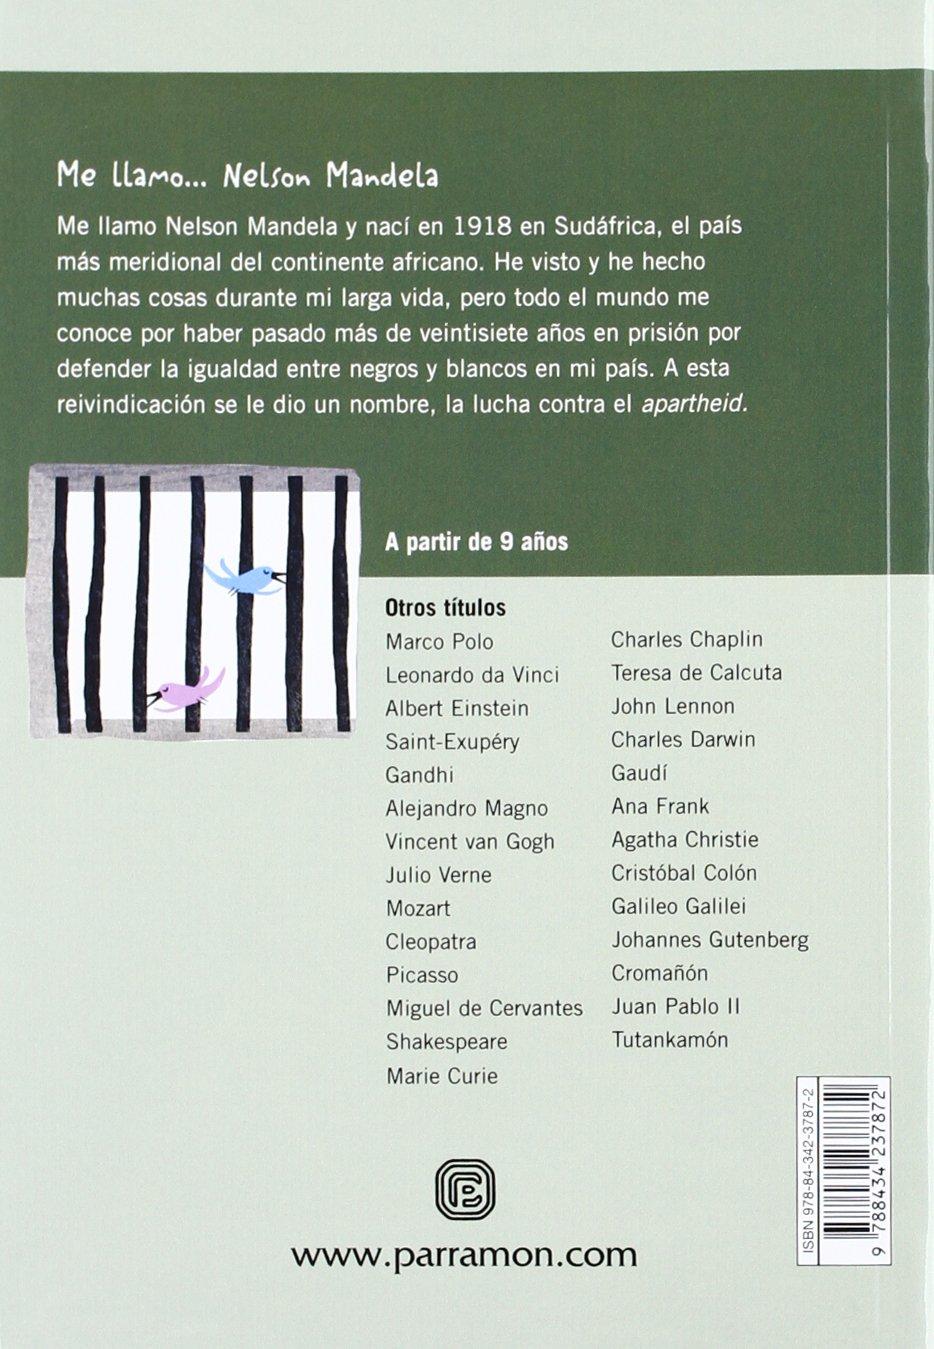 ME LLAMO NELSON MANDELA (Spanish Edition): Isabel Muntané, Africa Fanlo: 9788434237872: Amazon.com: Books